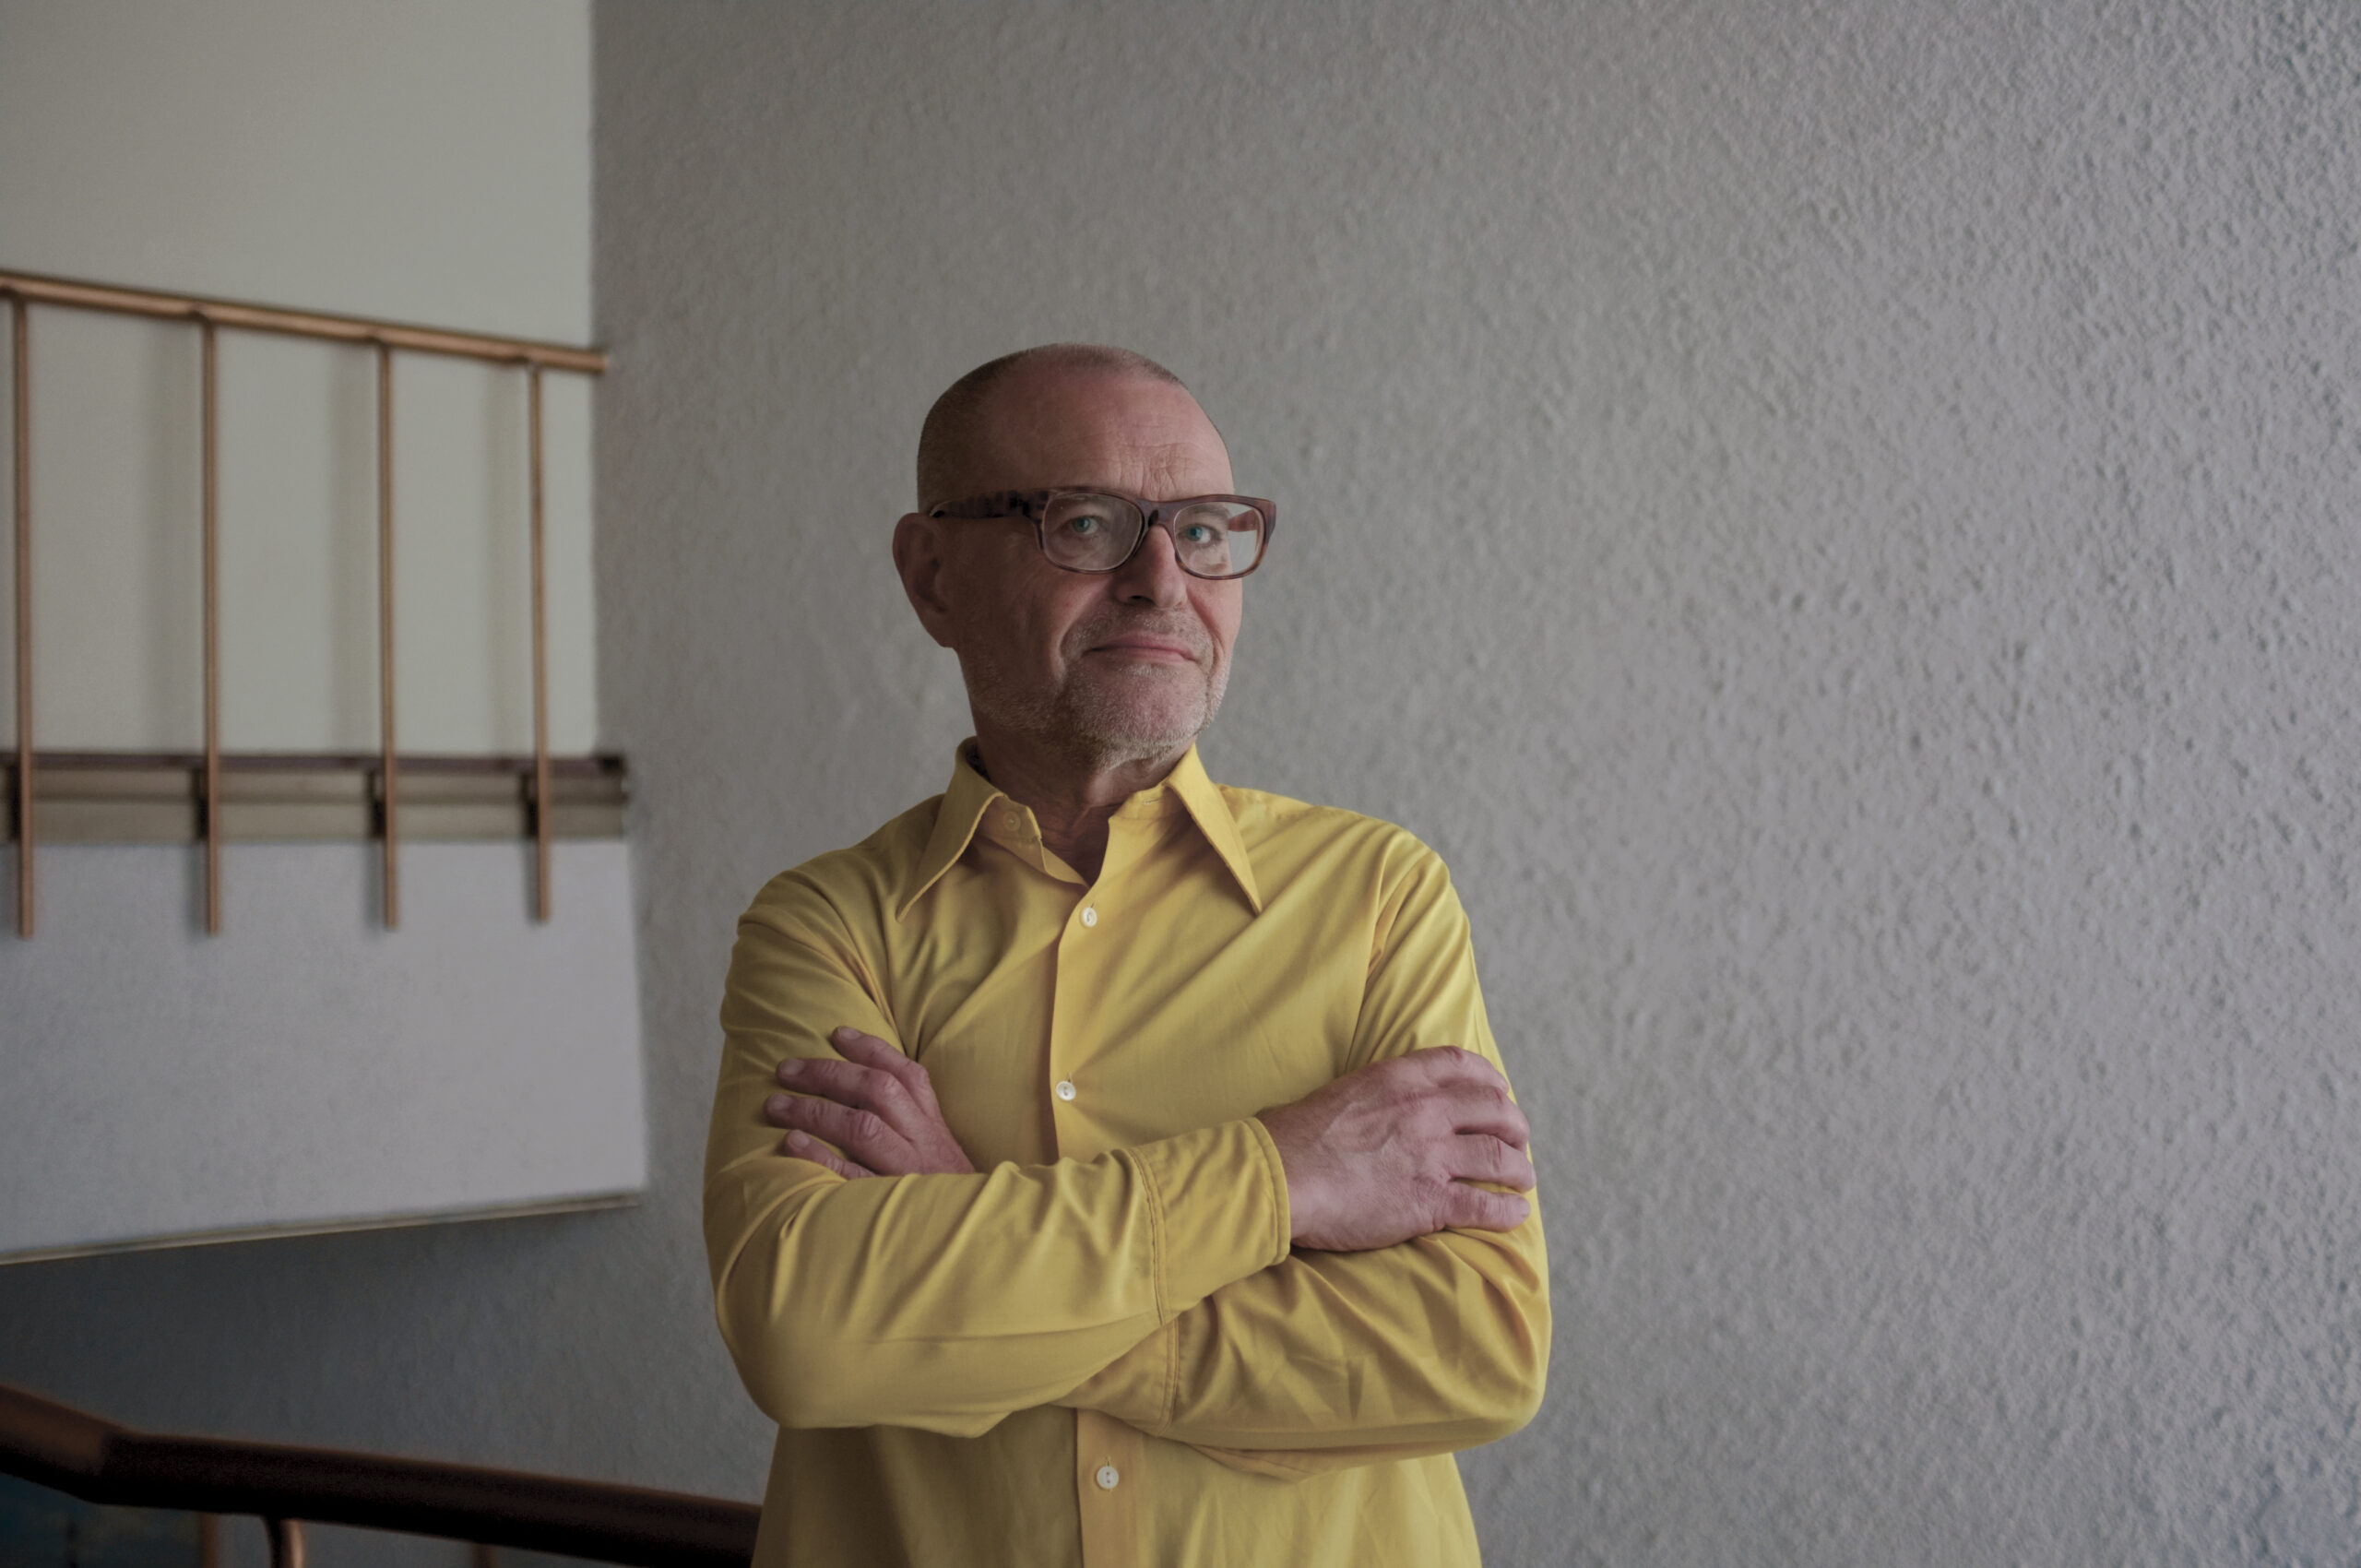 Георг Шольхаммер. Фото: Поліна Полікарпова